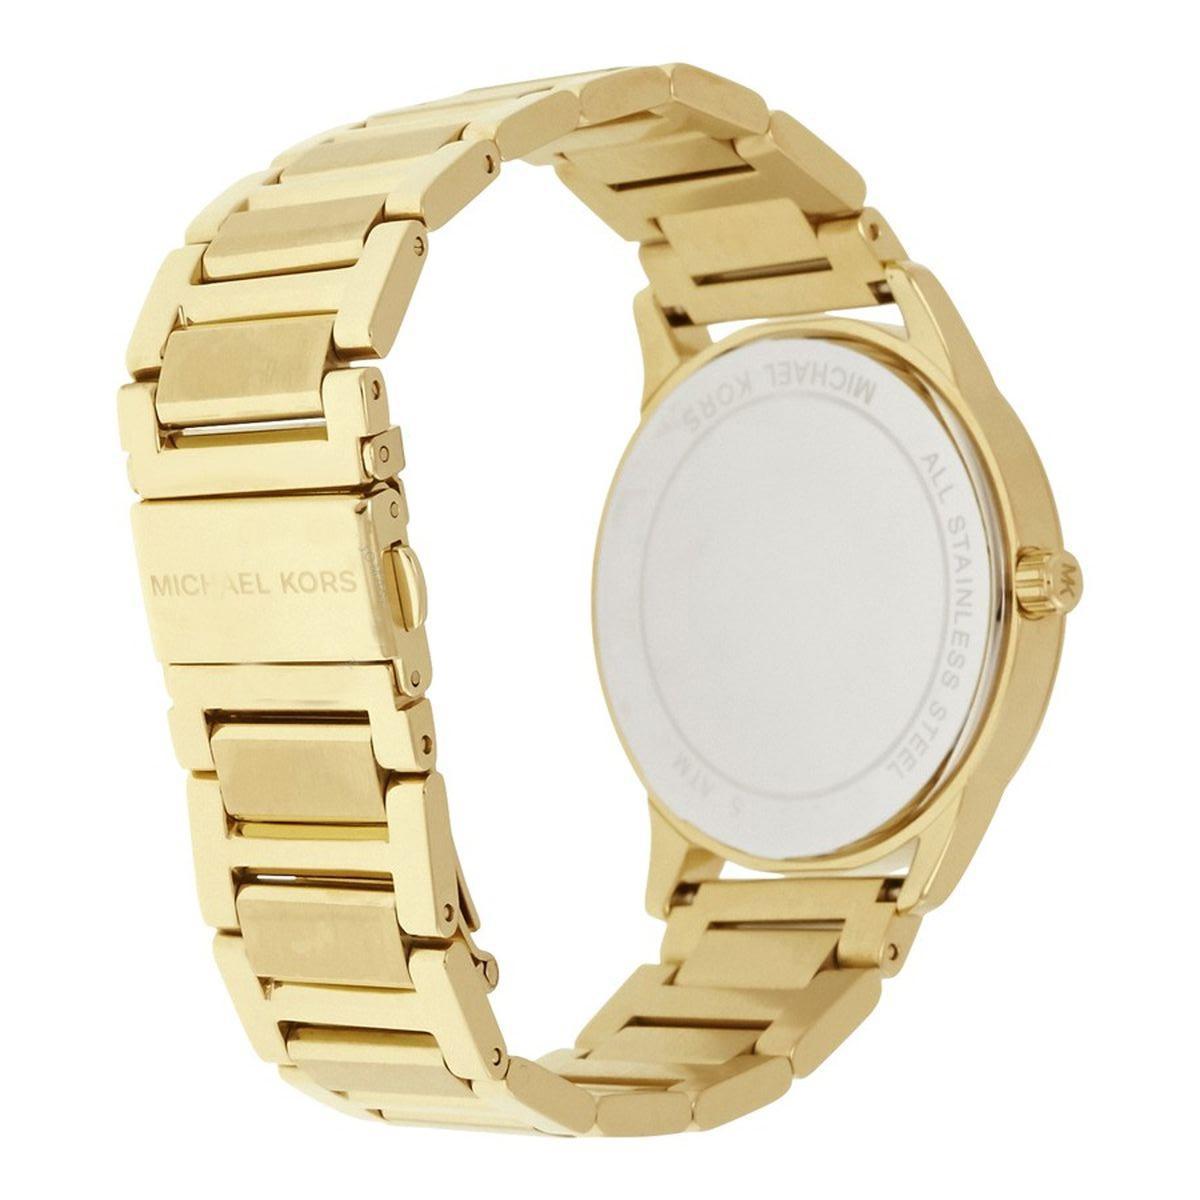 a6ea17caacf Relógio michael kors feminino mk3520 - Relógio Feminino - Magazine Luiza